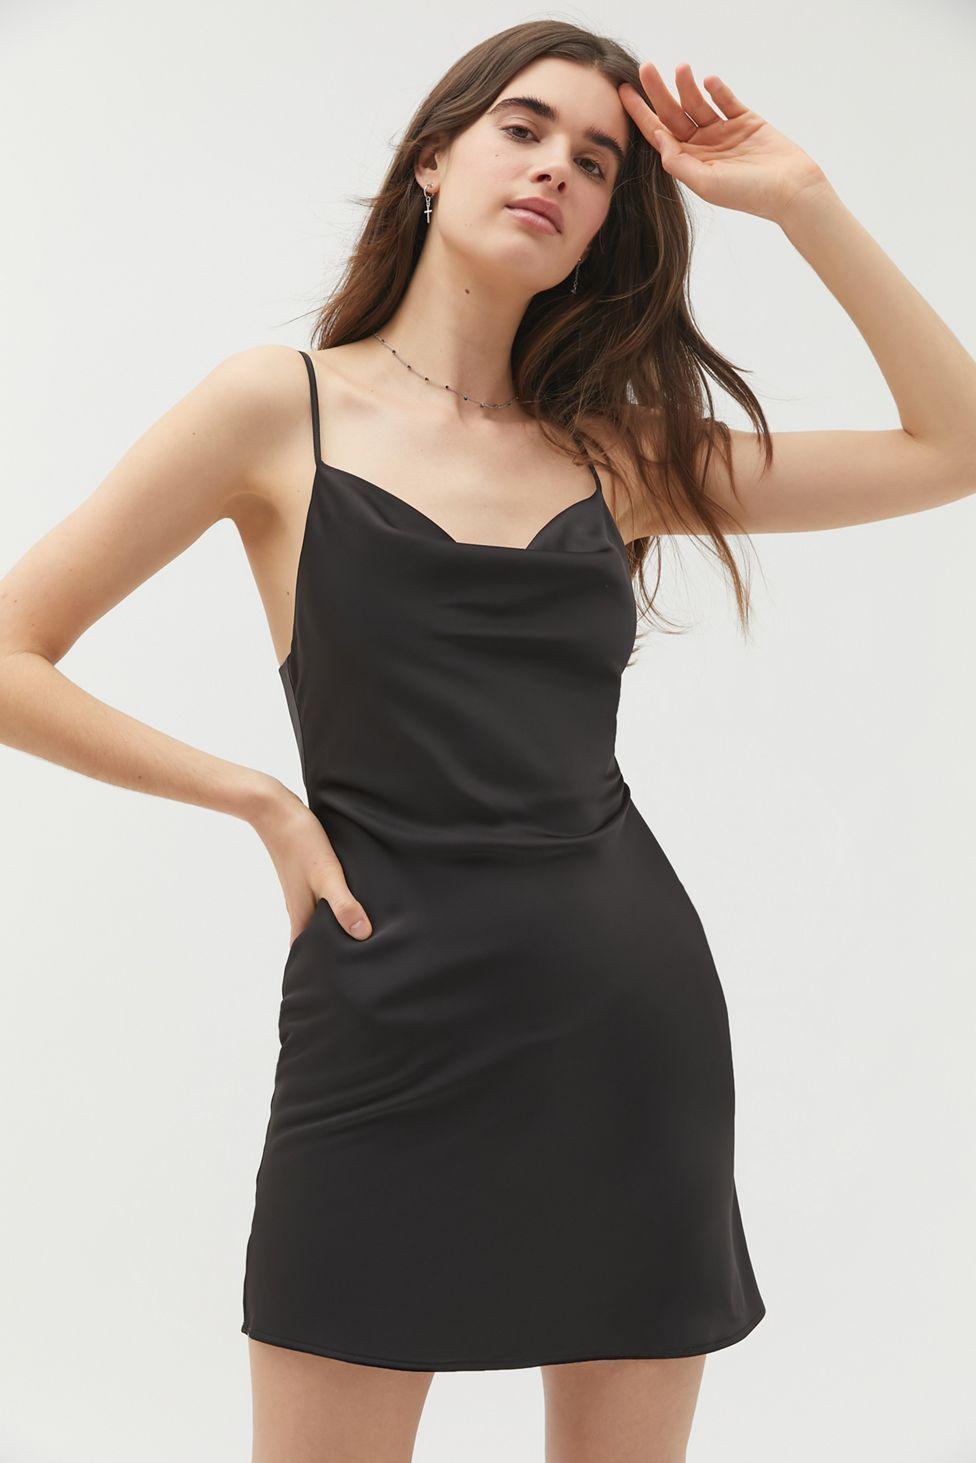 Uo Mallory Cowl Neck Slip Dress In 2020 Slip Dress Mini Slip Dress Satin Slip Dress [ 1463 x 976 Pixel ]